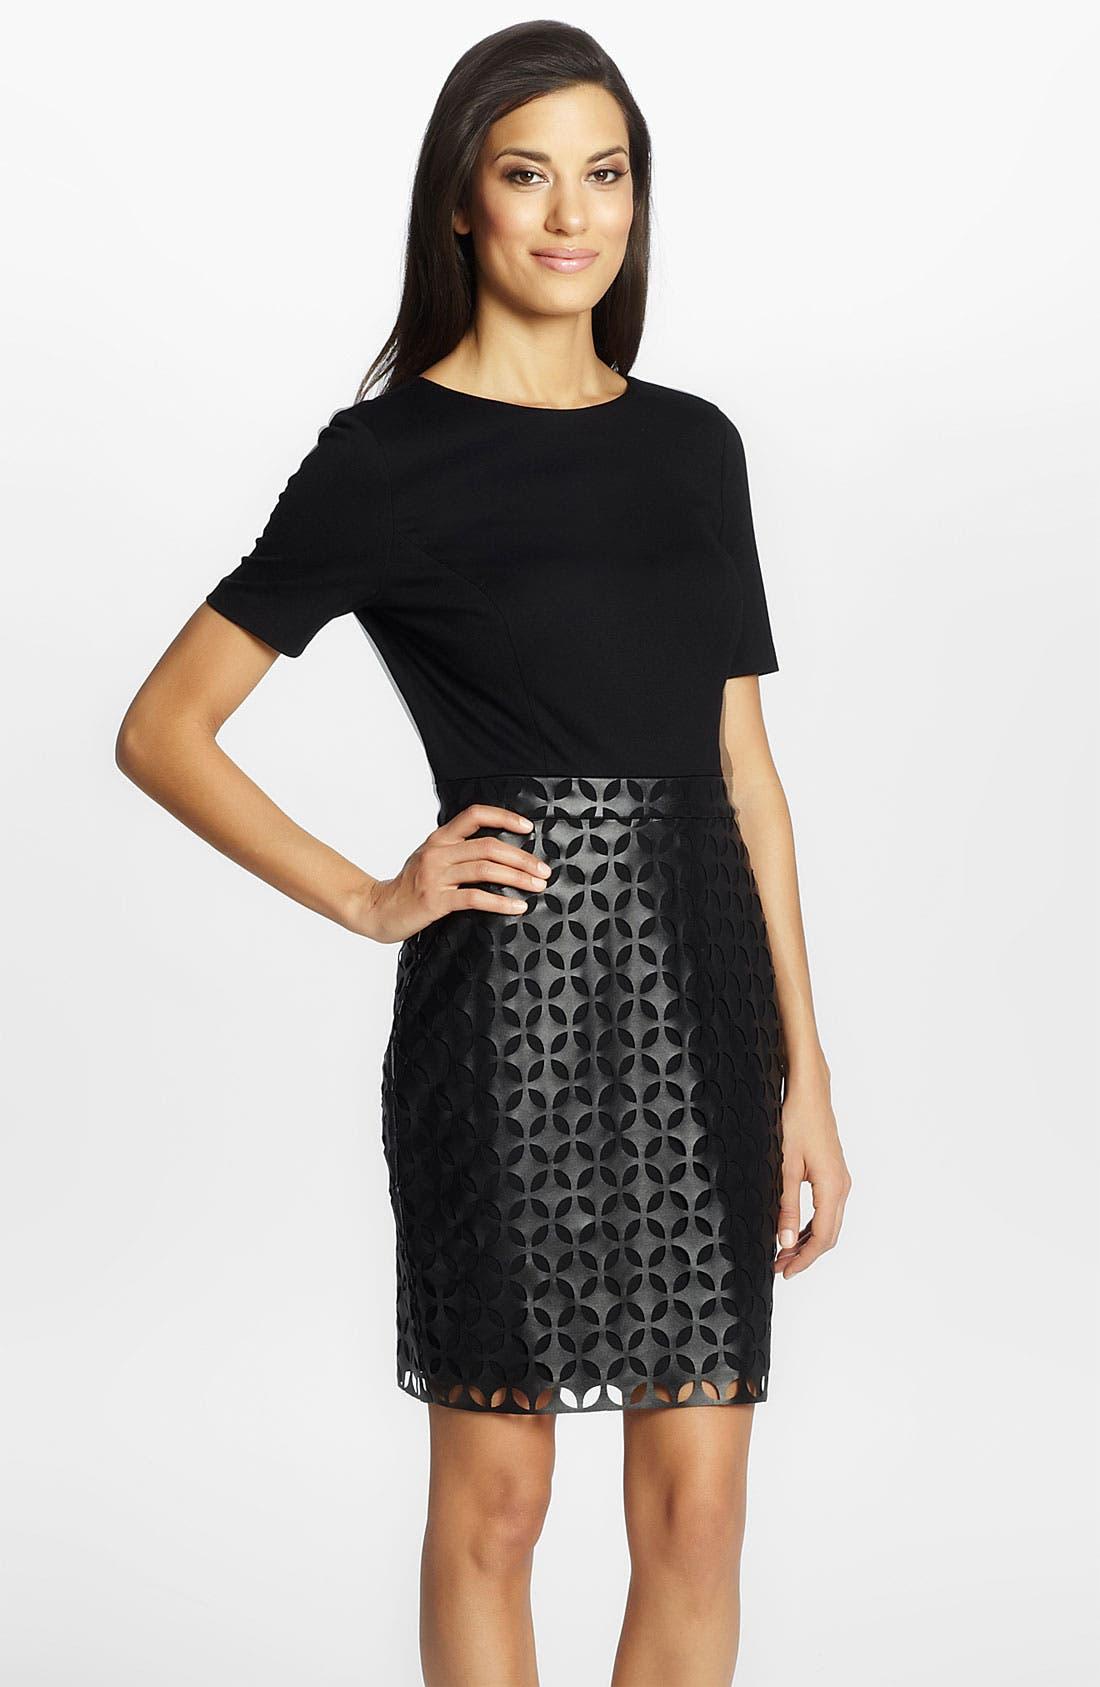 Alternate Image 1 Selected - Cynthia Steffe 'Amelia' Laser Cut Leather Dress